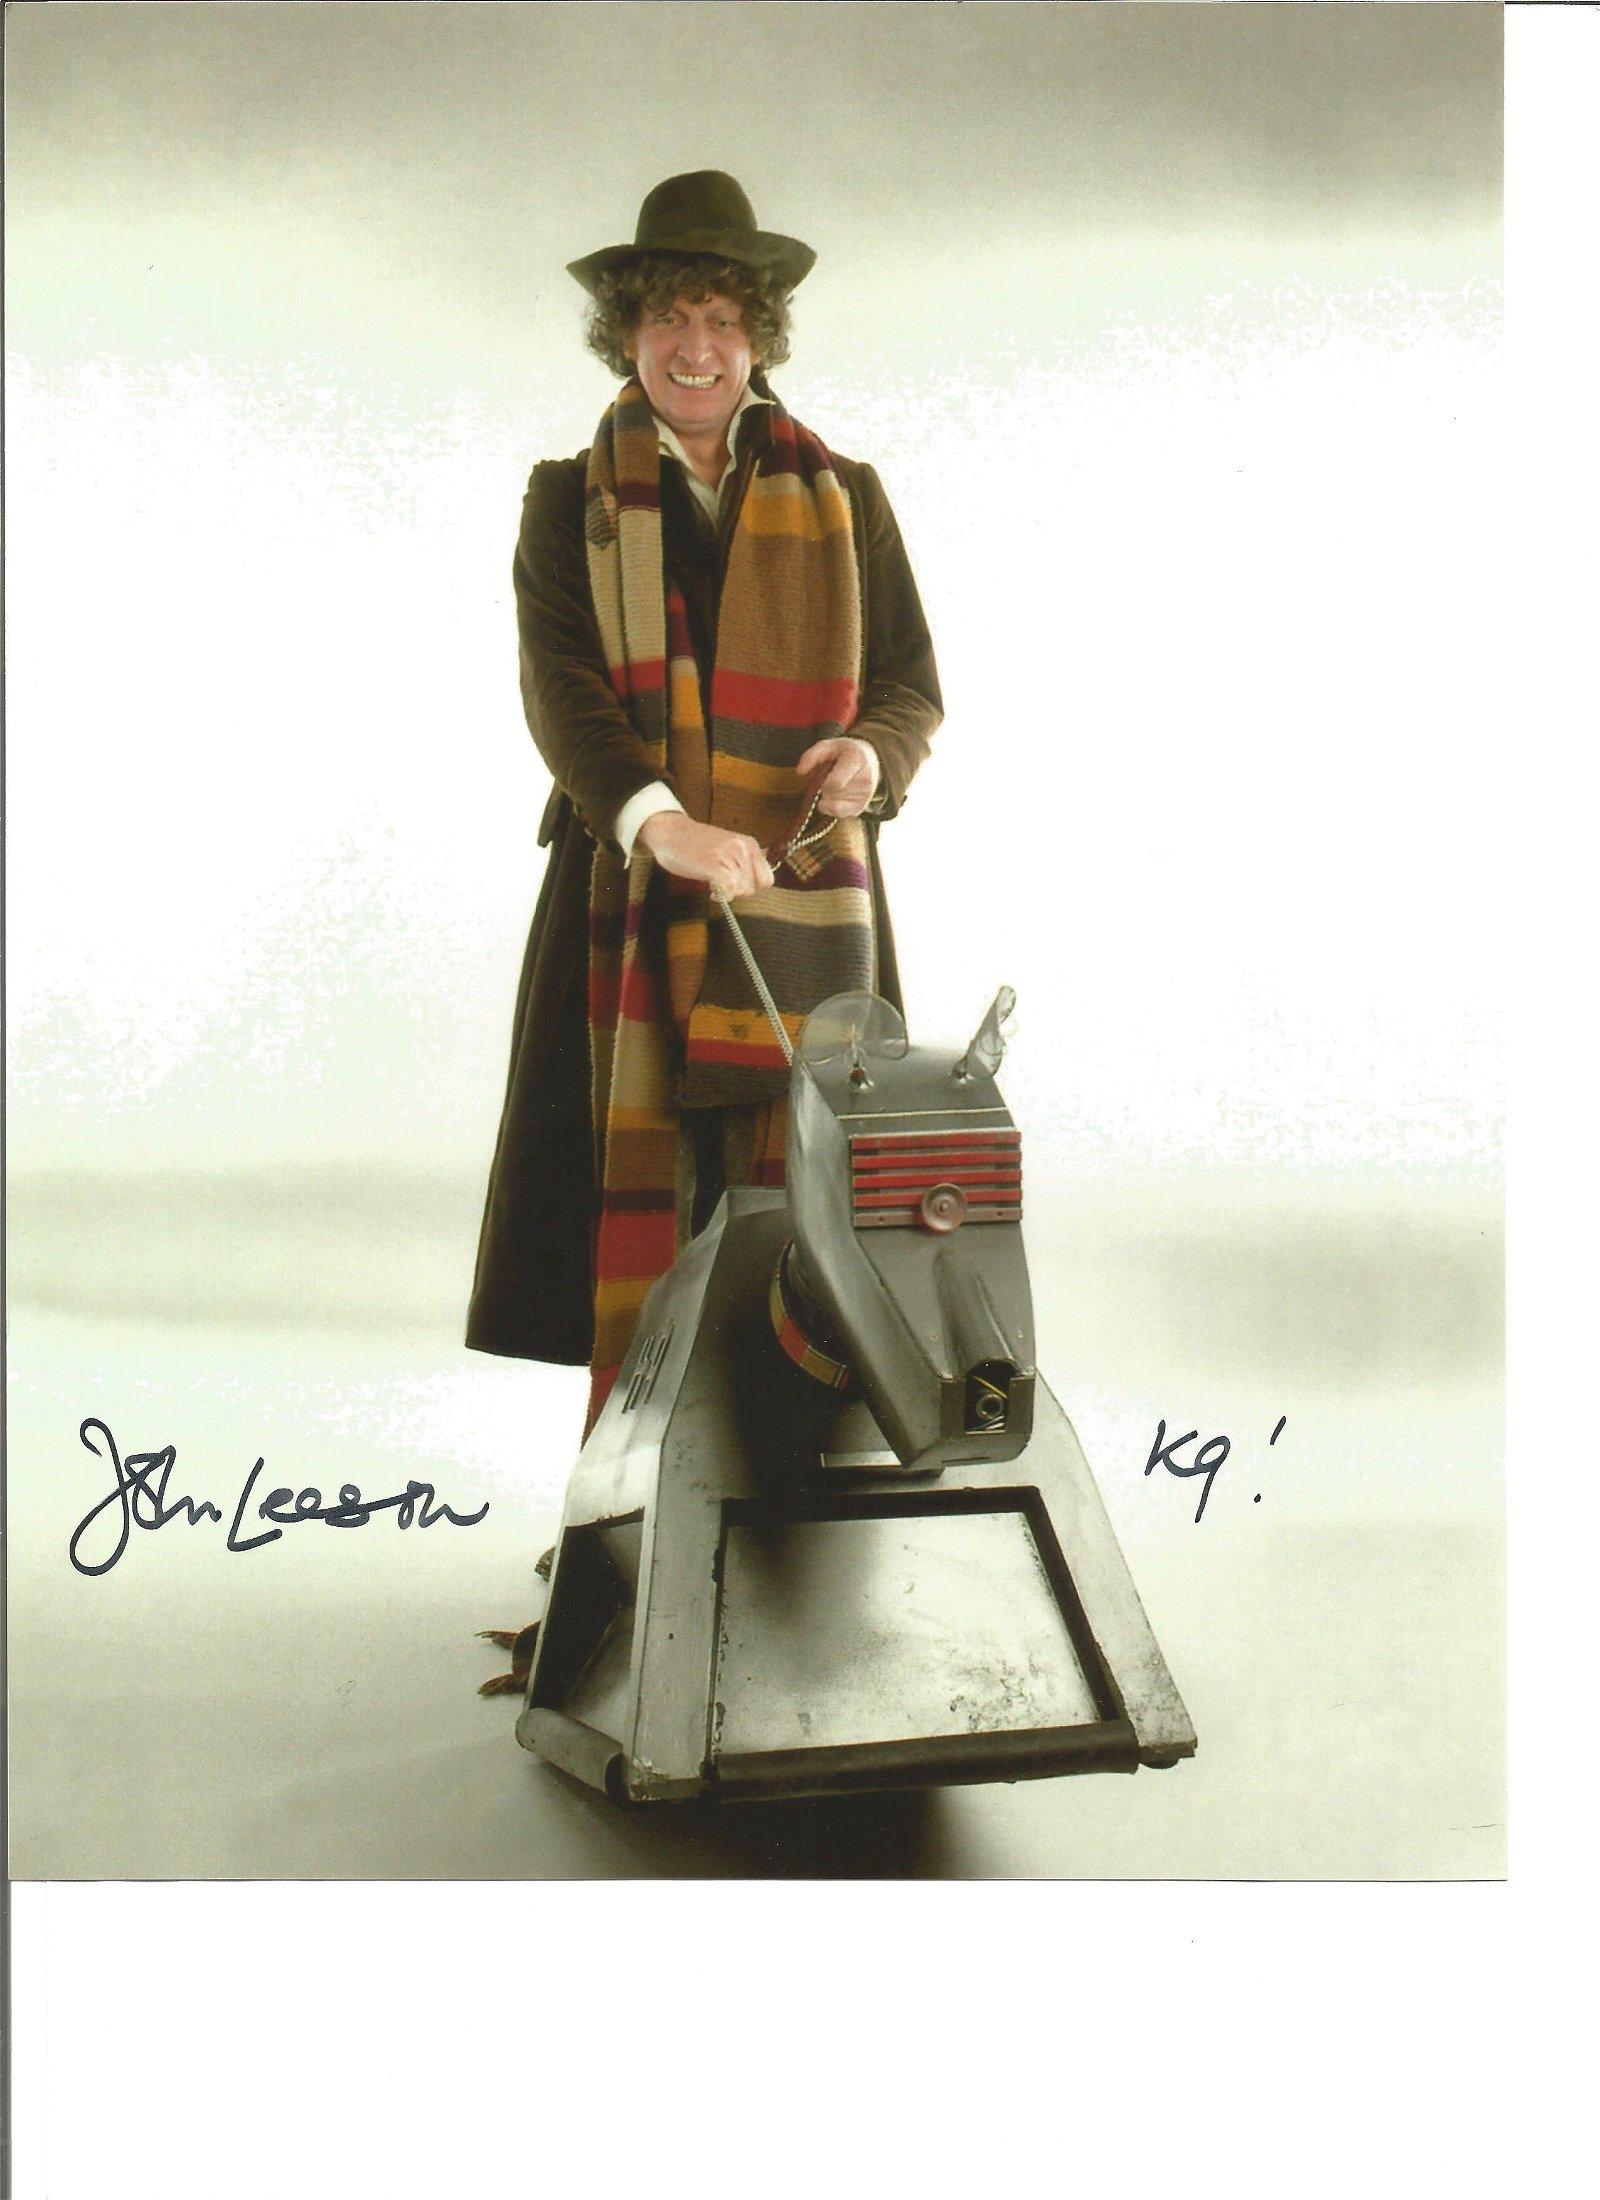 K9 voice John Leeson Dr Who signed colour photo of K9